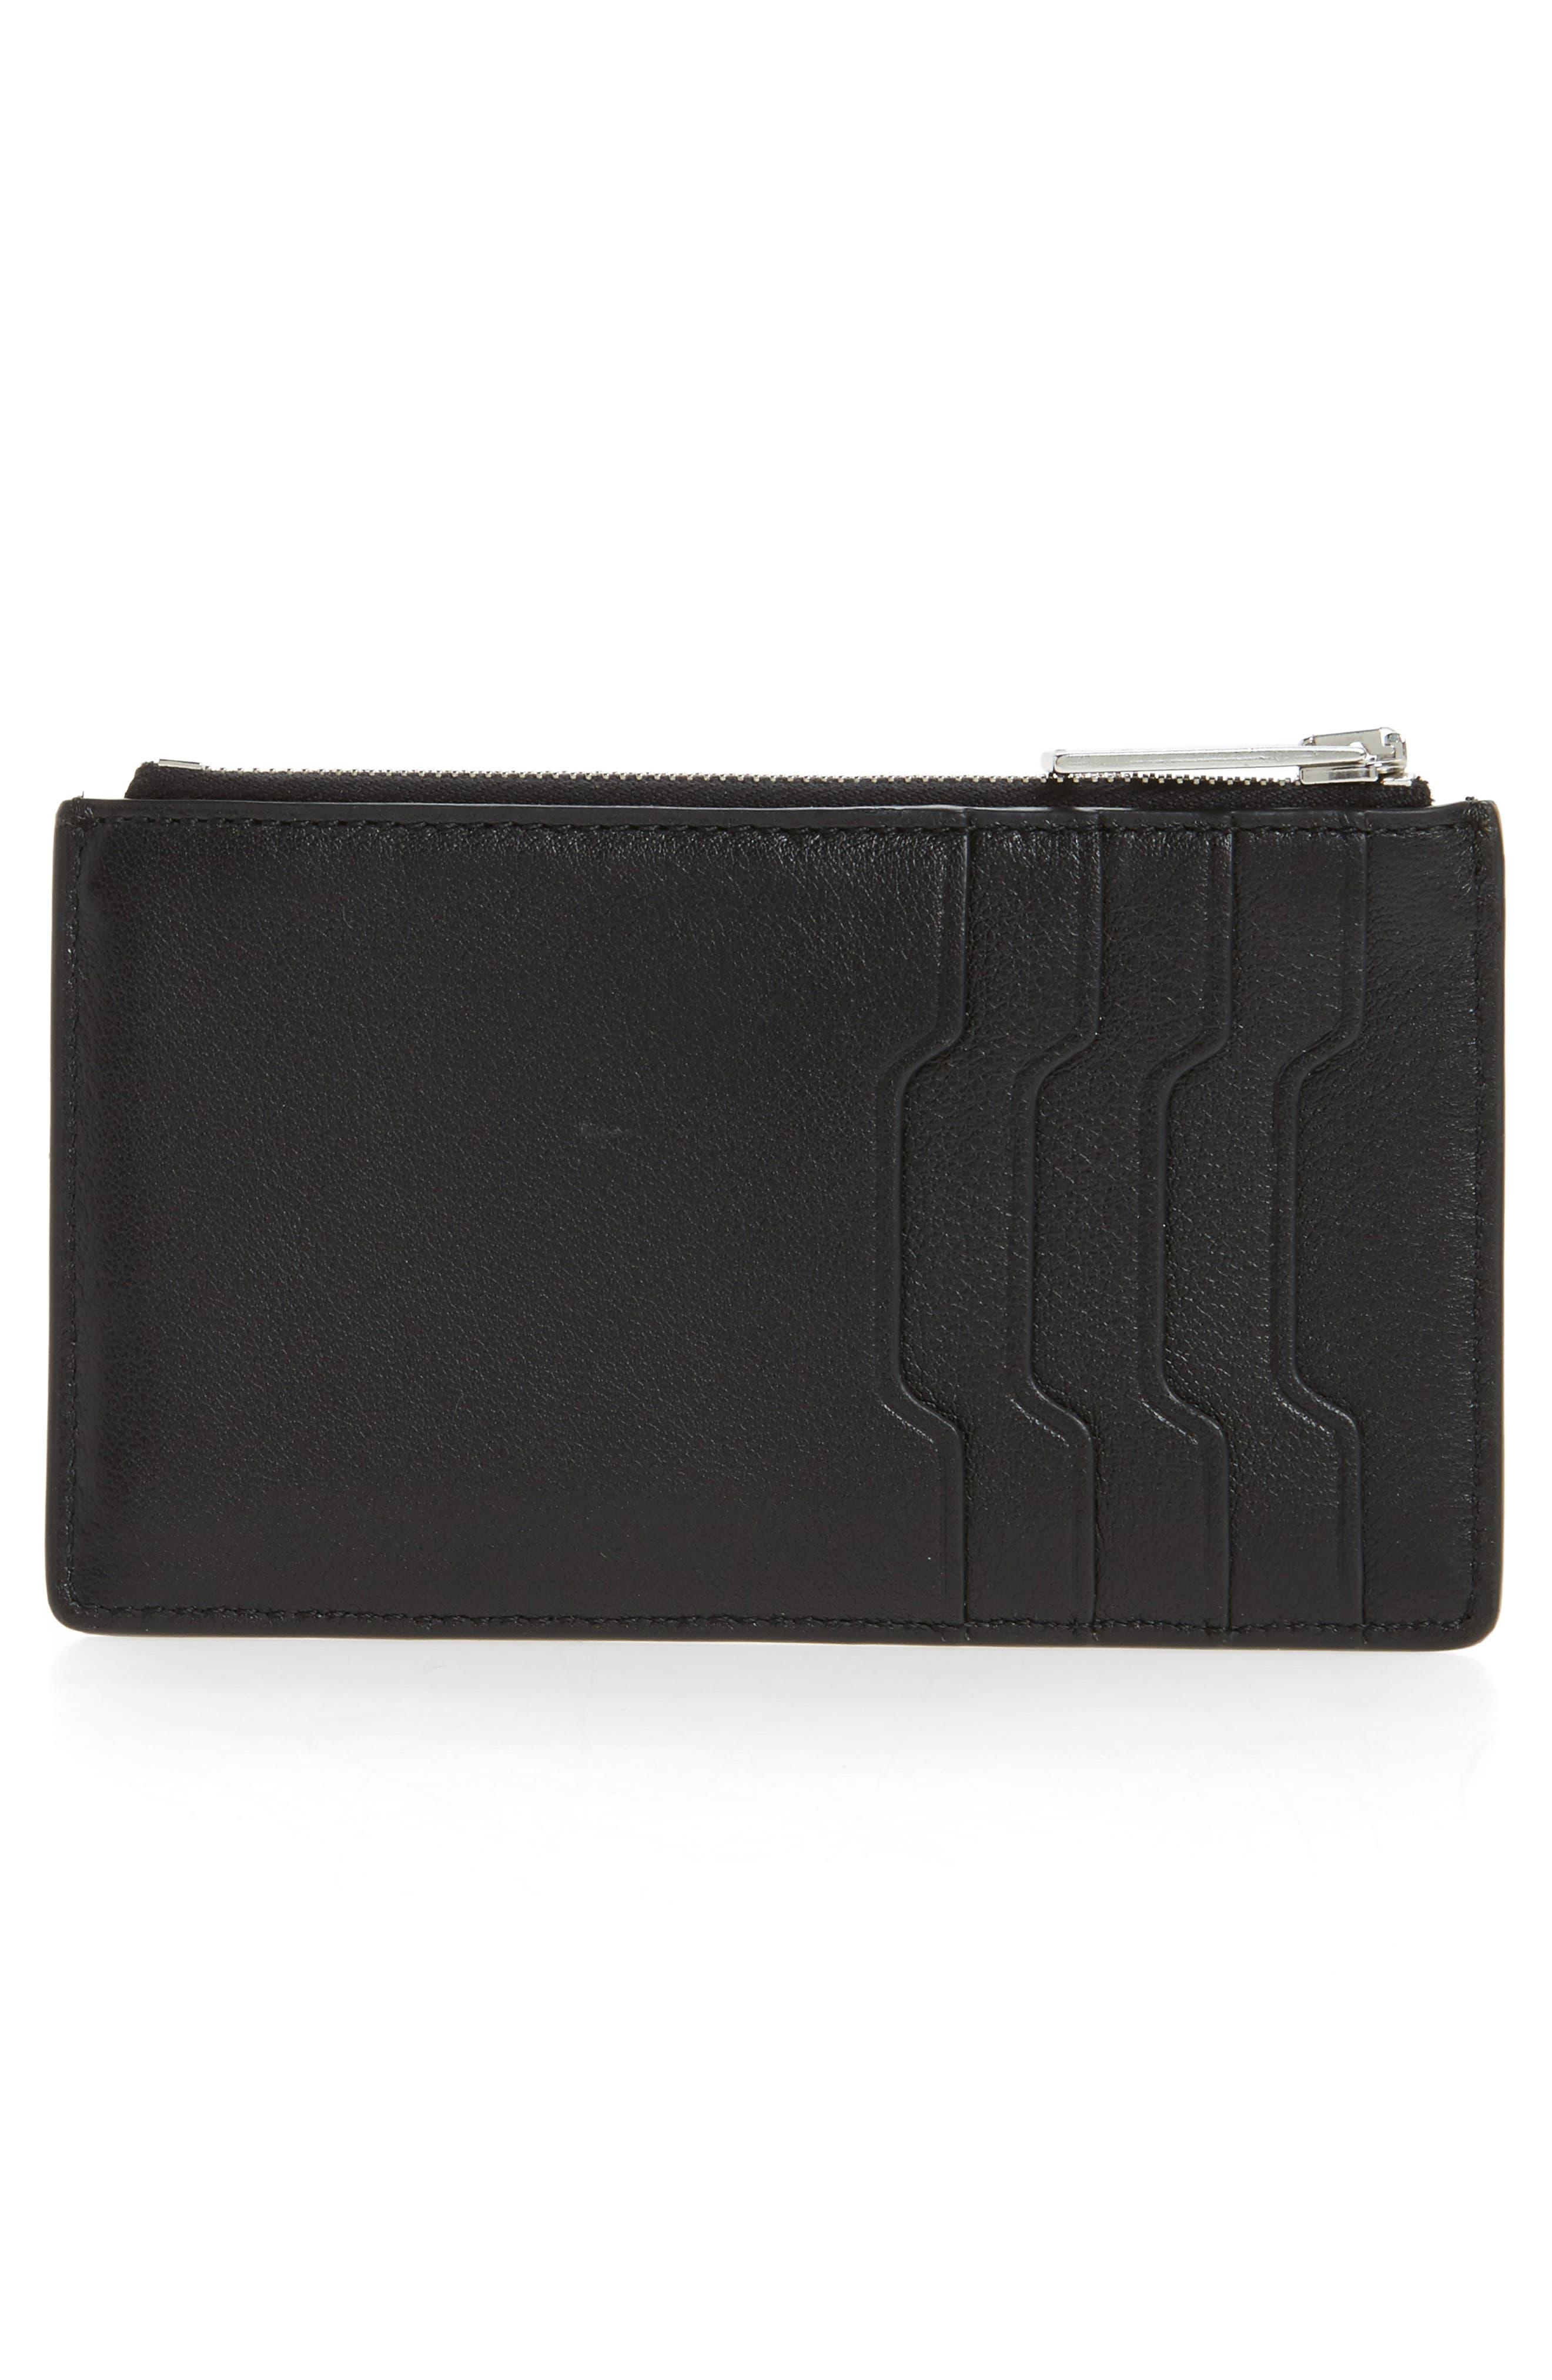 Studded Leather Card Case,                             Alternate thumbnail 2, color,                             Black Studs